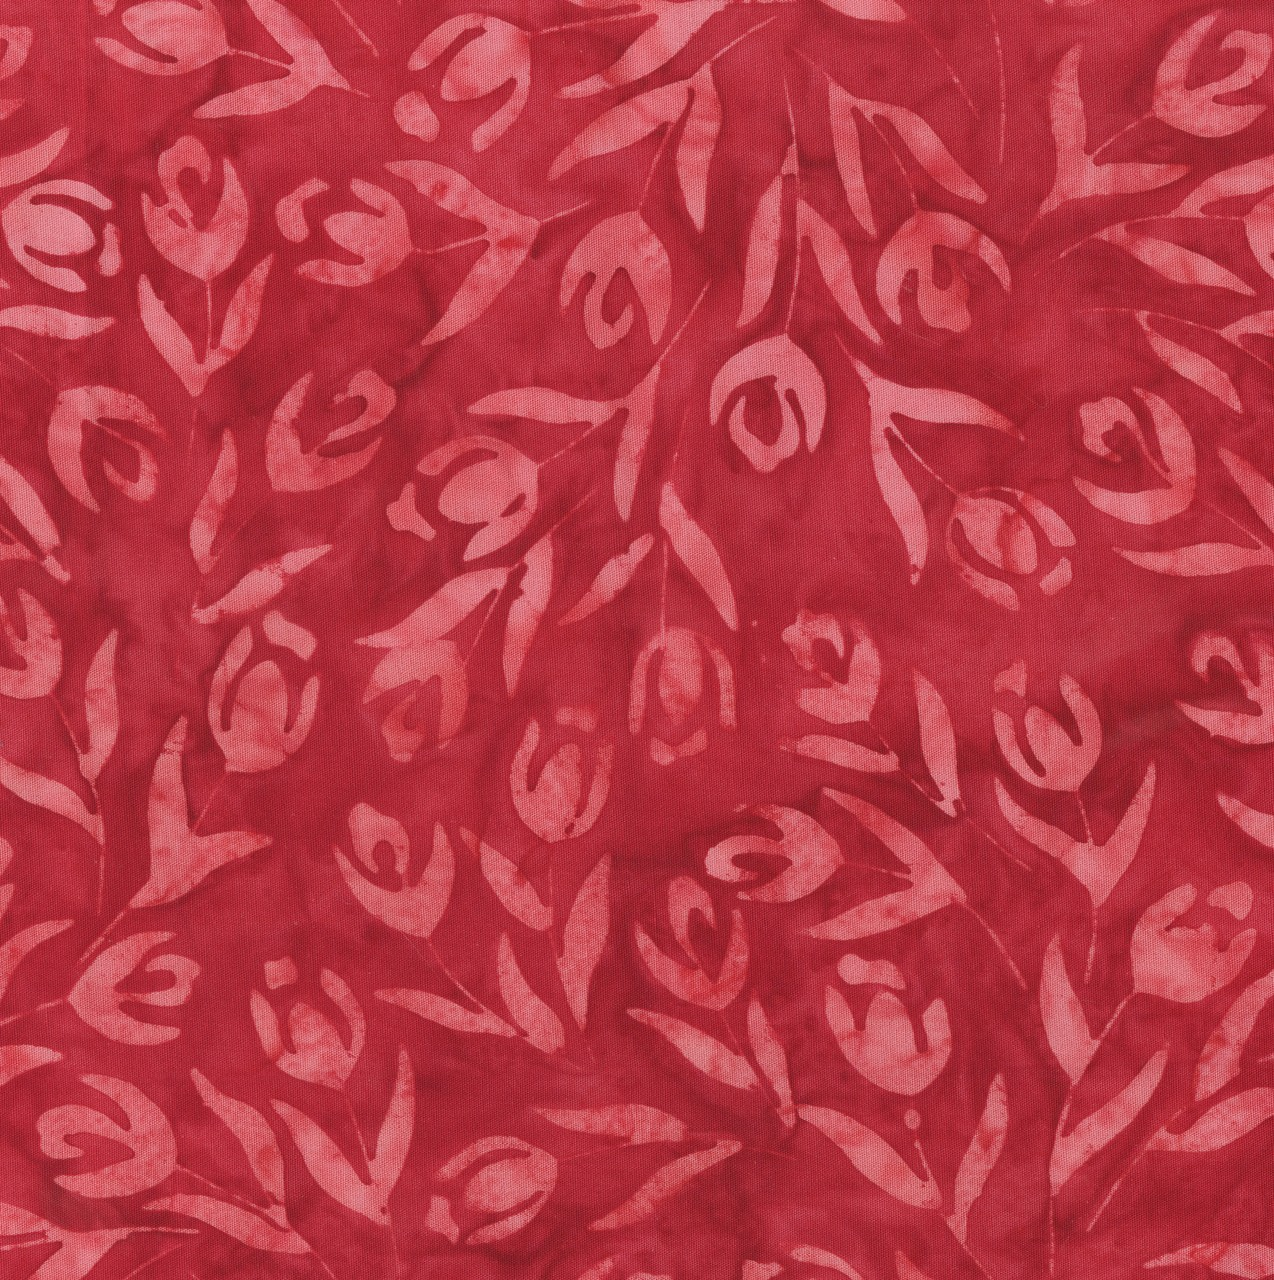 7391 Rød m. lysere tulipaner Bali/batik